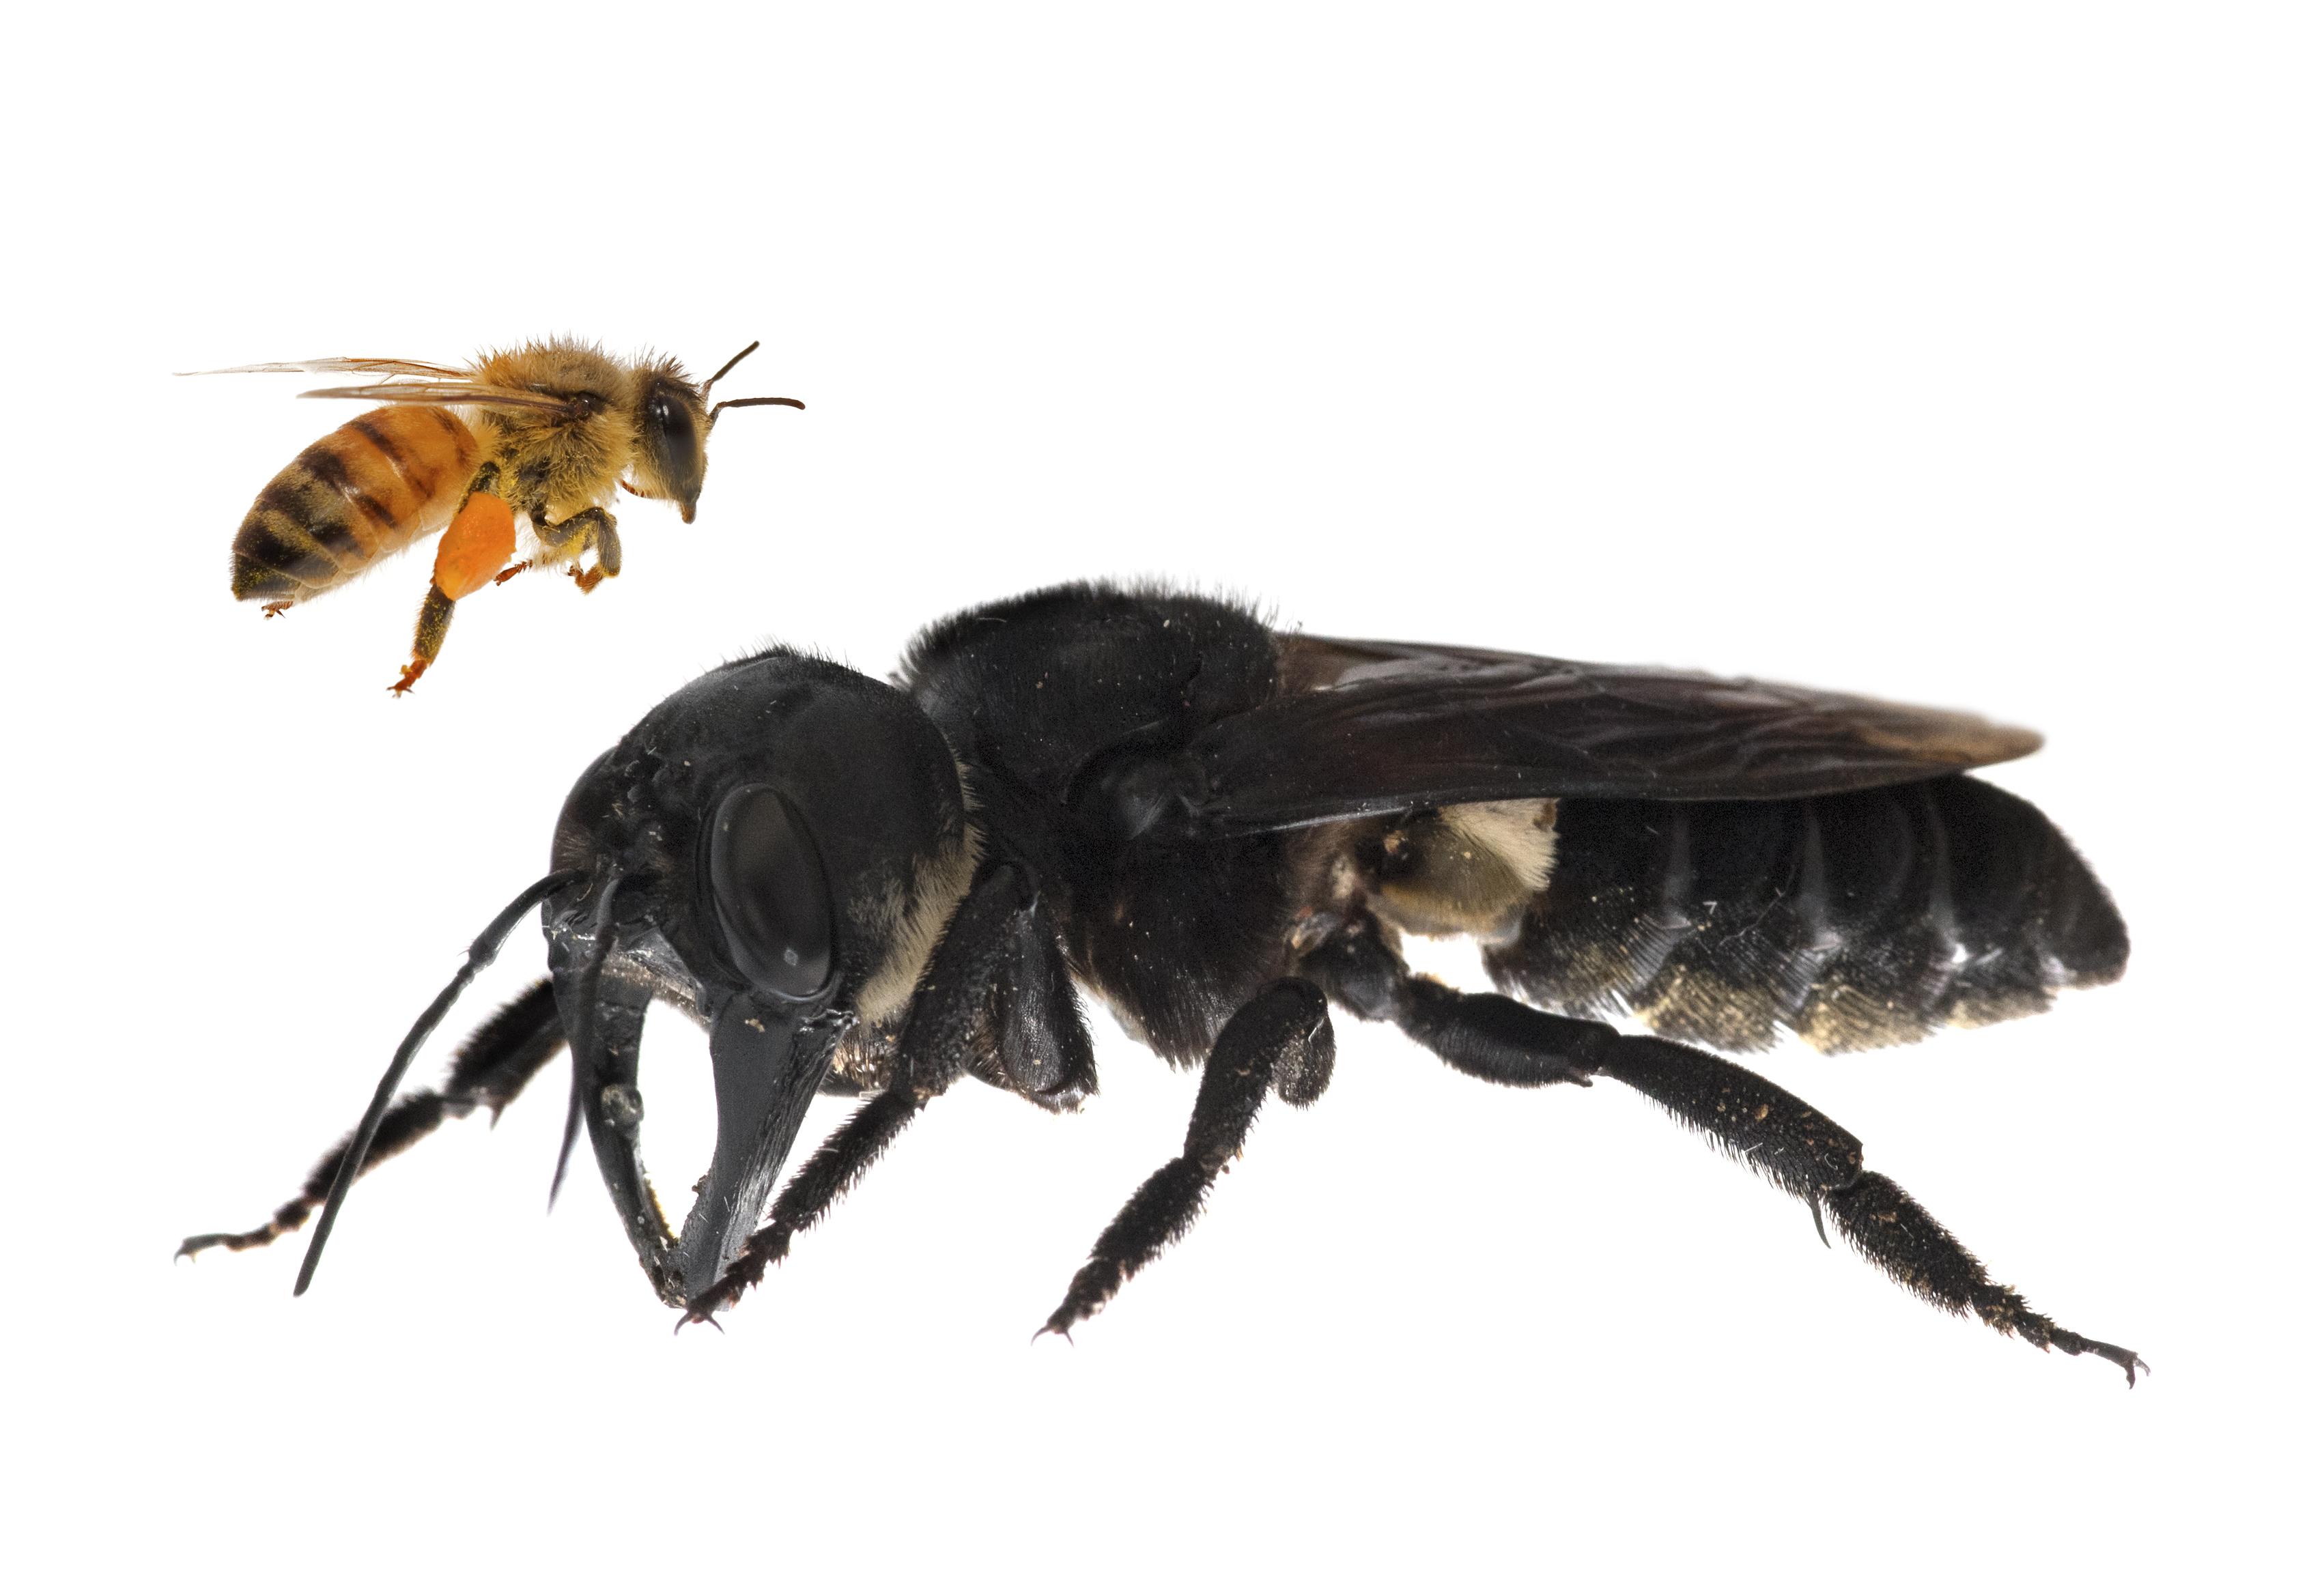 <i>Megachile pluto</i>— самая крупная напланете пчела (для сравнения изображена обычная медоносная пчела). Фото: Clay Bolt